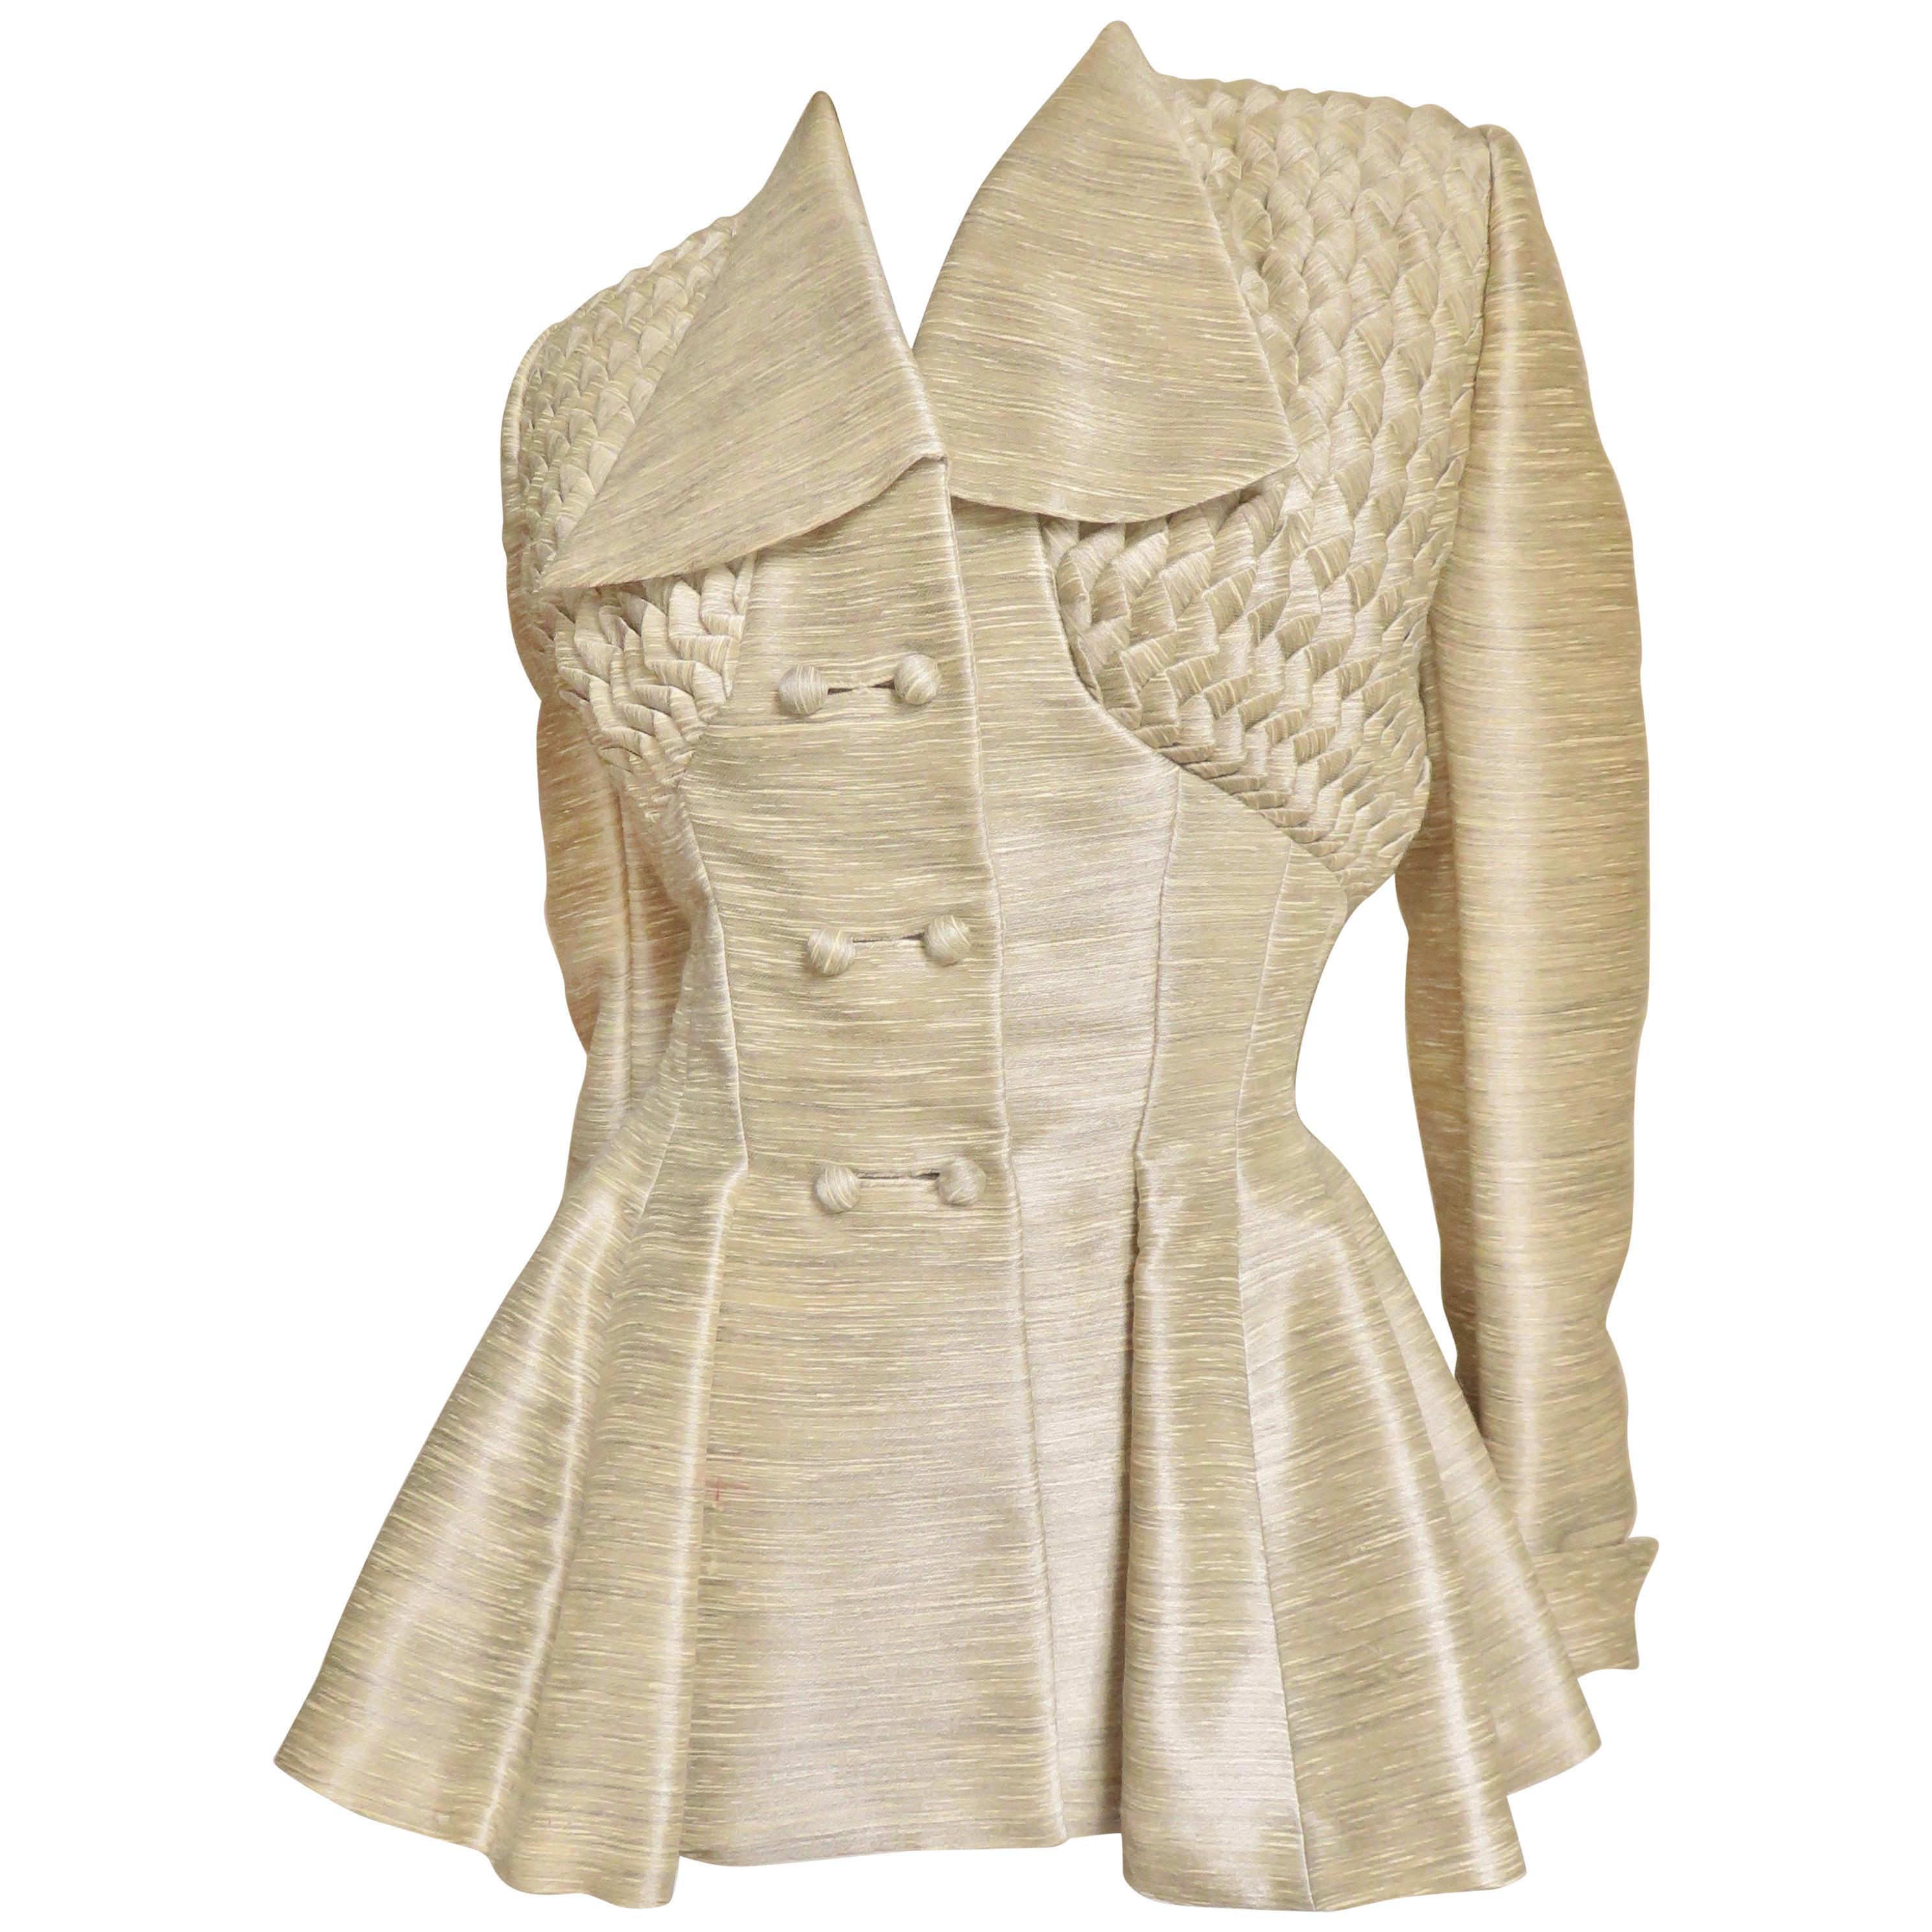 1940s Lilli Ann Silk Jacket with Elaborate Detail